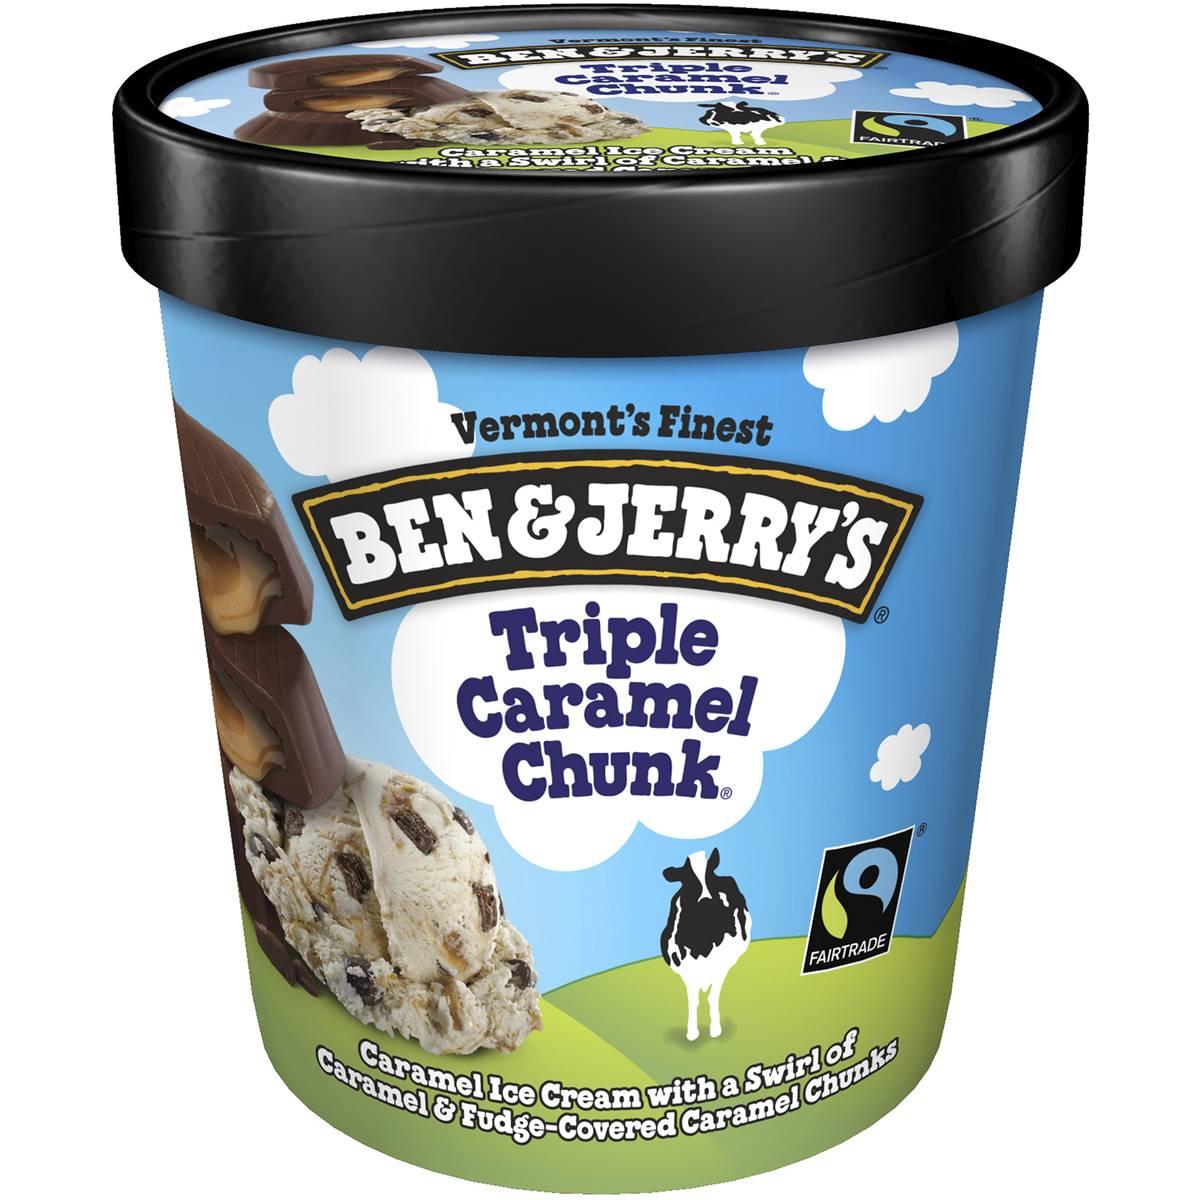 Ben & Jerry's Triple Caramel Chunk Ice Cream